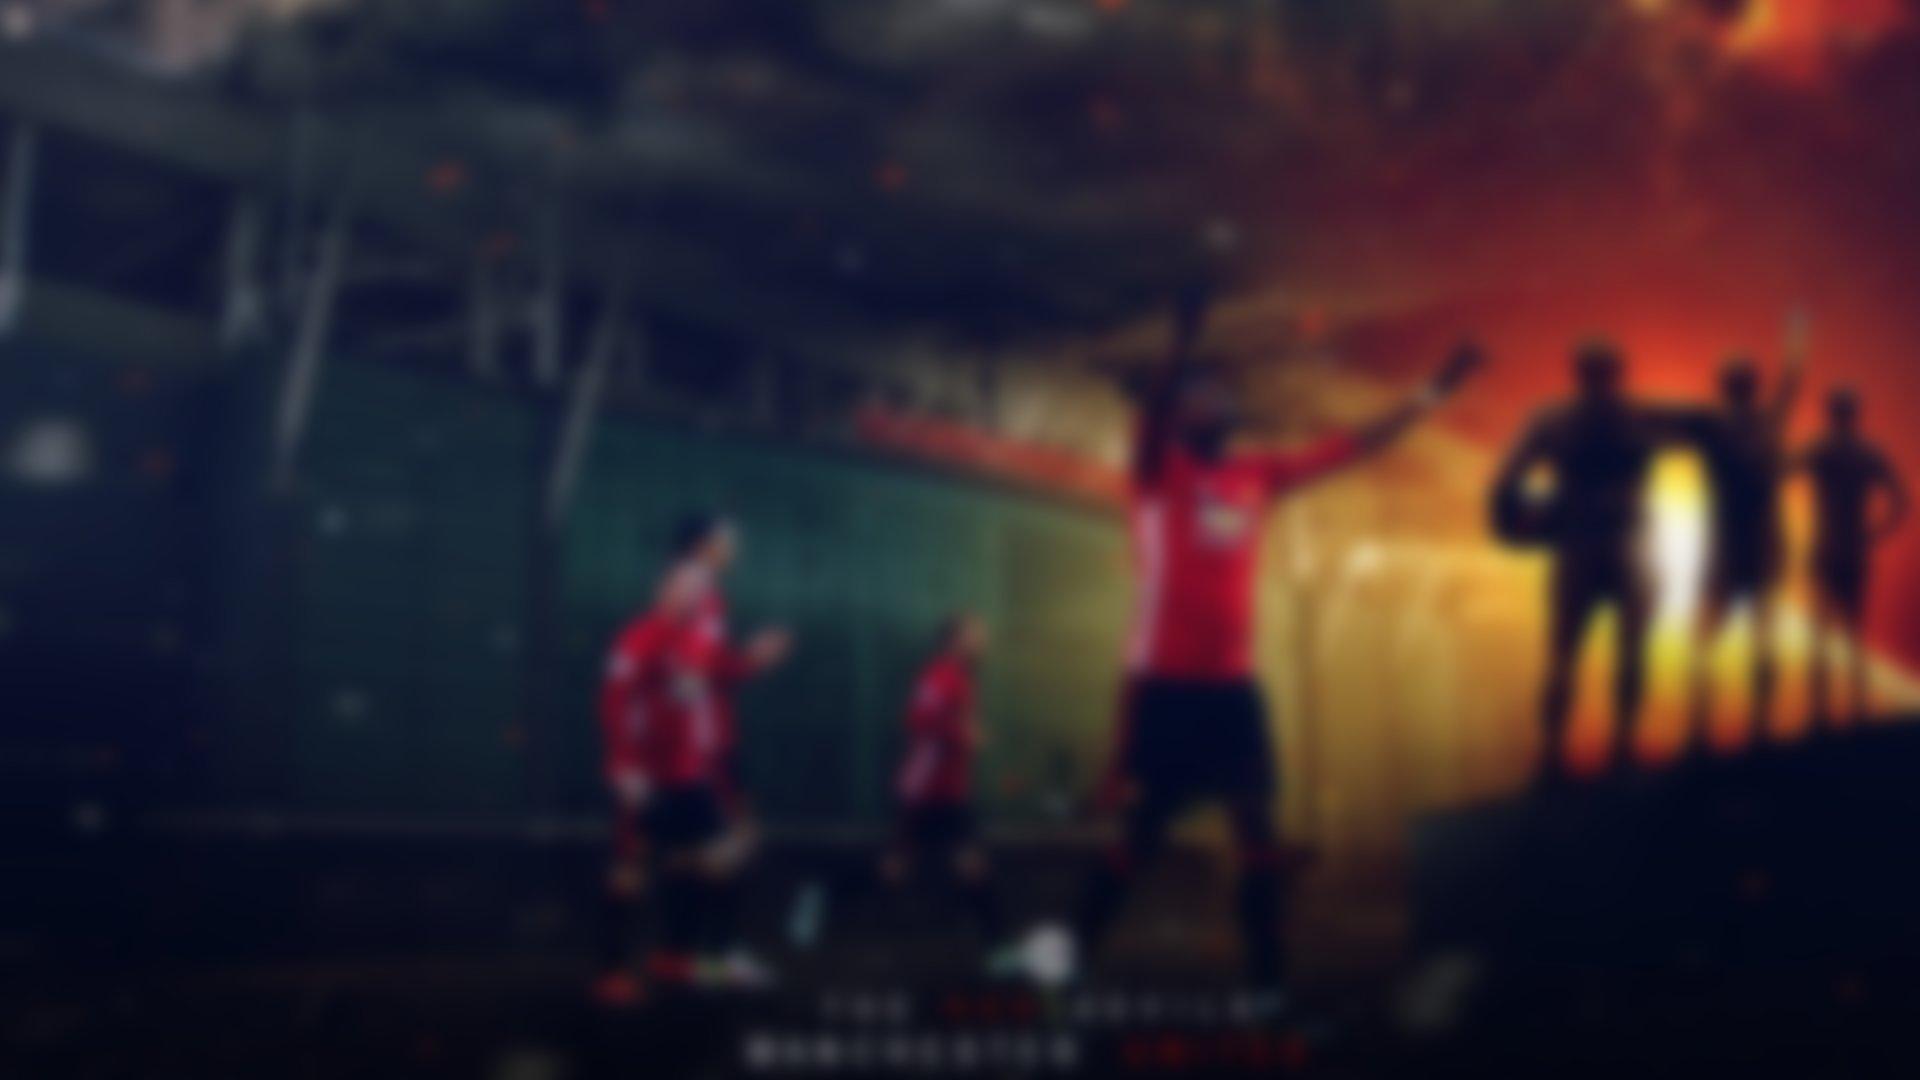 Manchester United Logo Wallpaper 4K HD 2020 Download